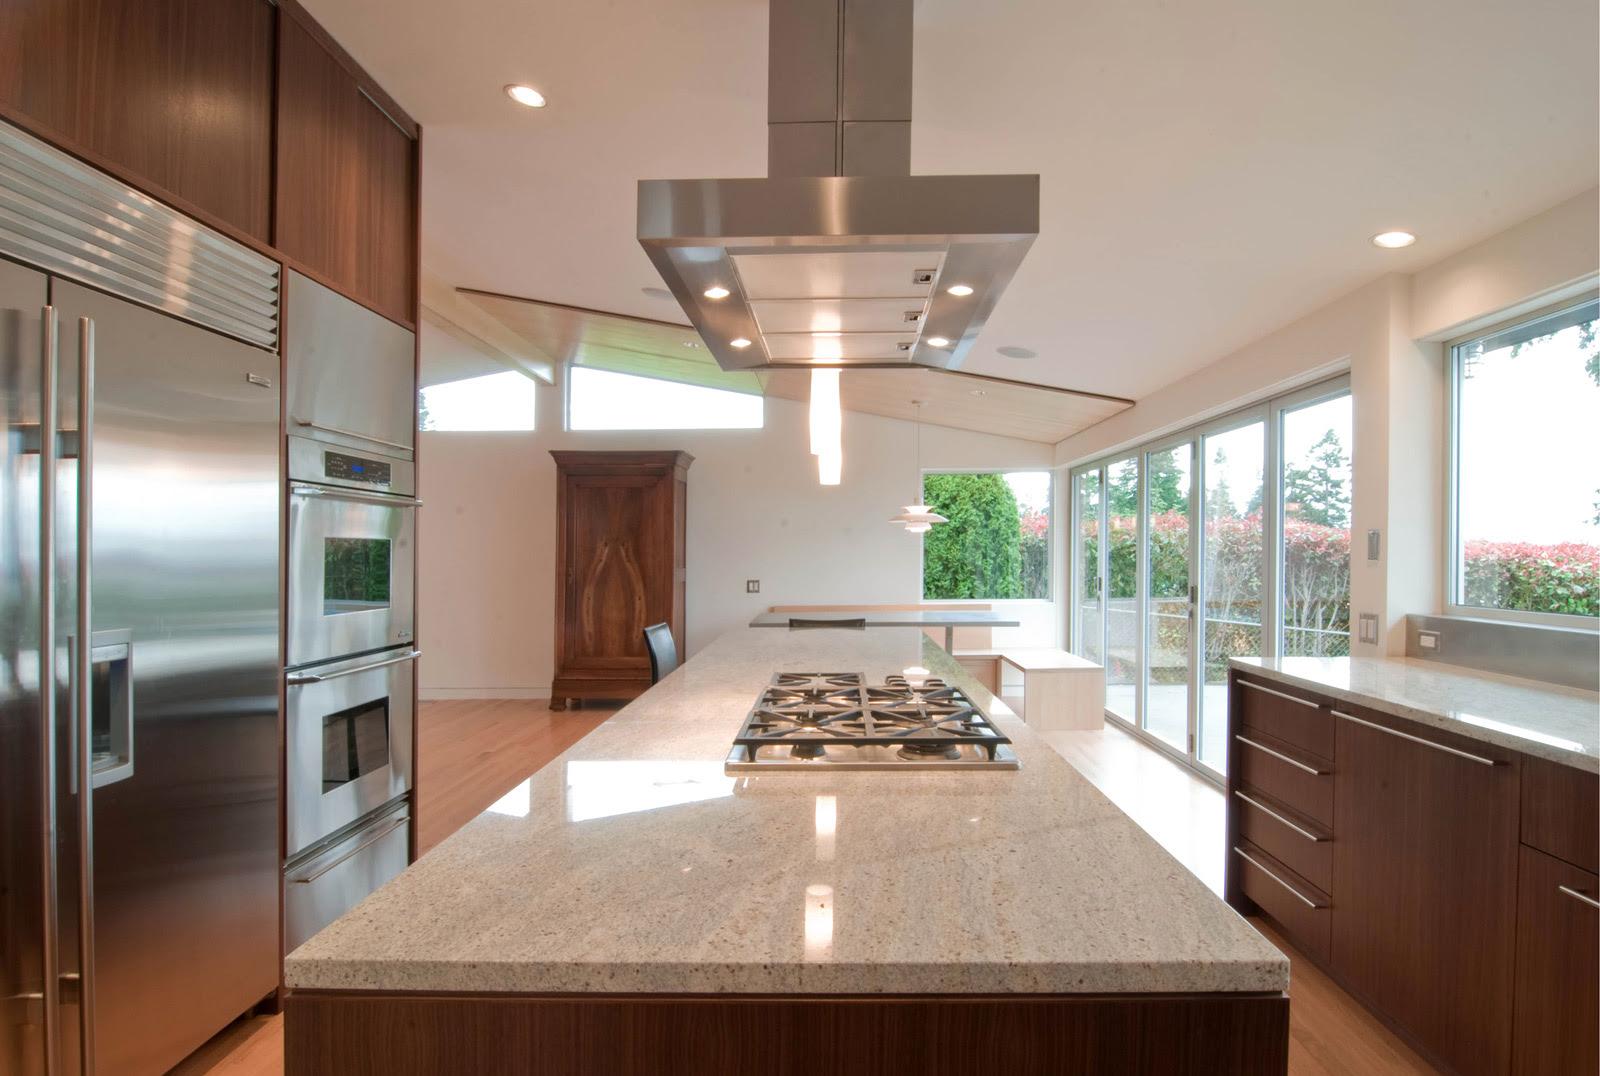 Kitchen Exhaust Hood Design